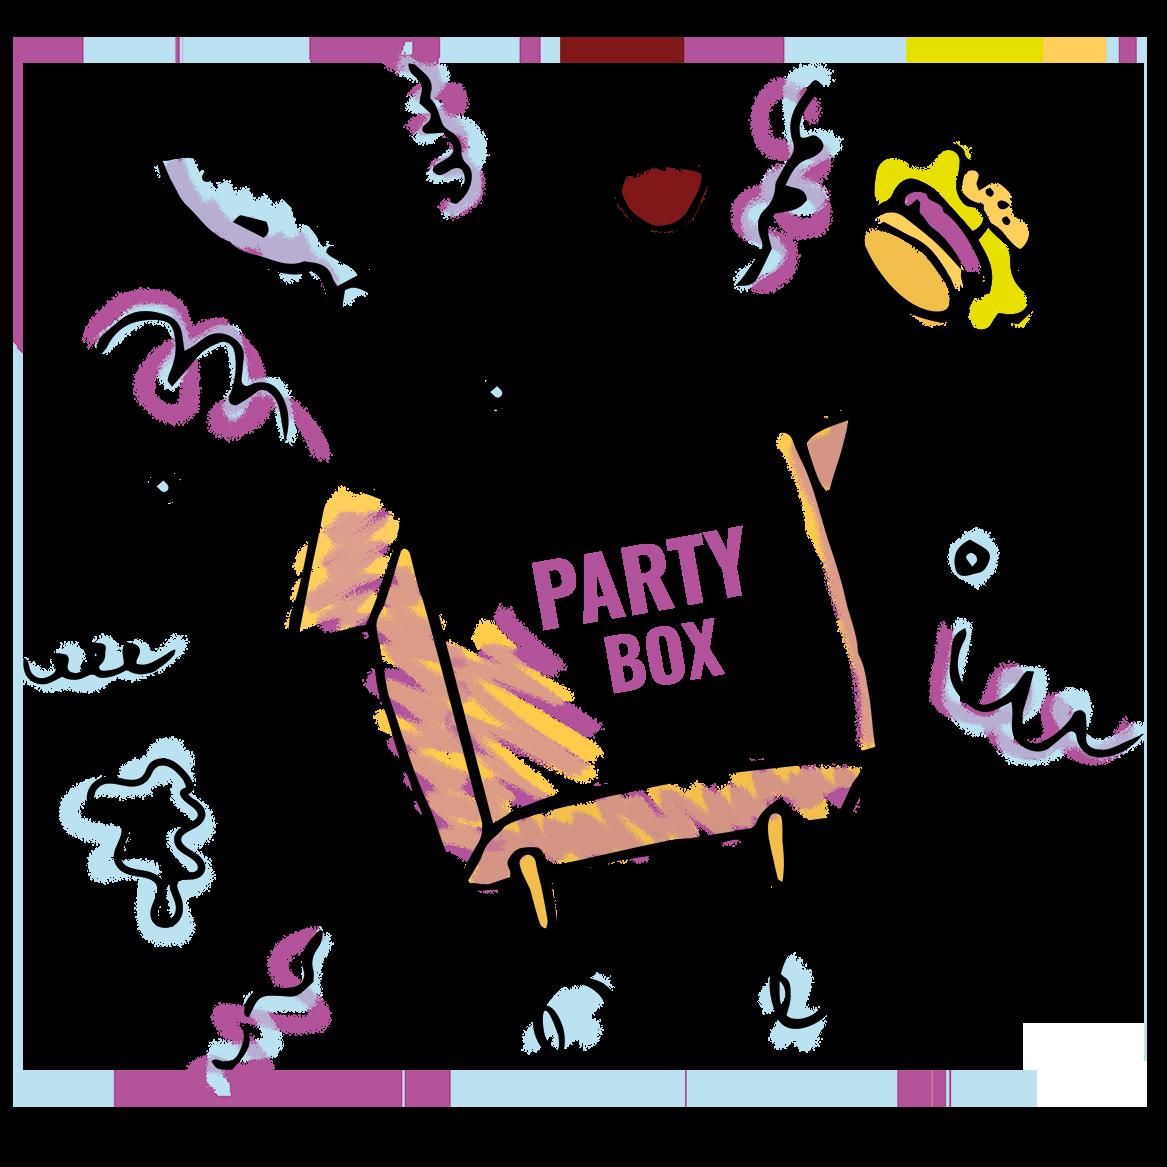 Survo Rentin tarjoama PartyBox-catering.